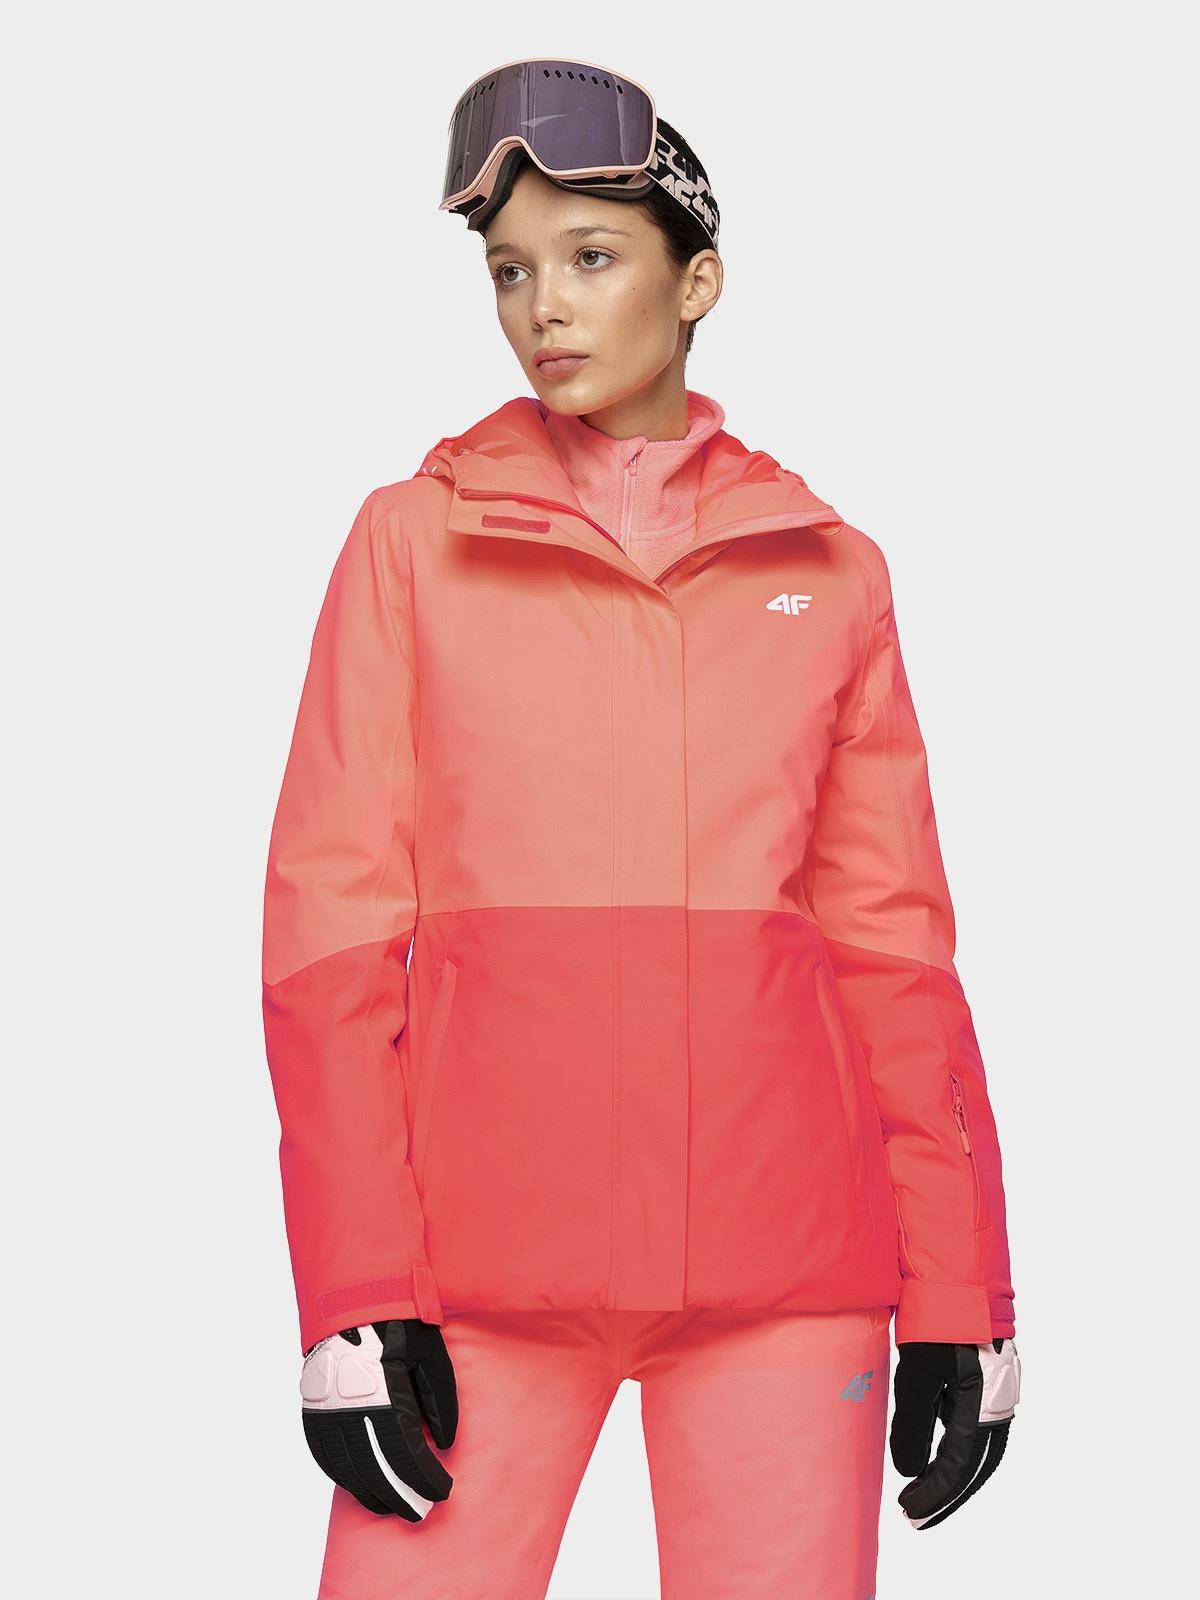 Kurtka narciarska damska KUDN302 - koral neon